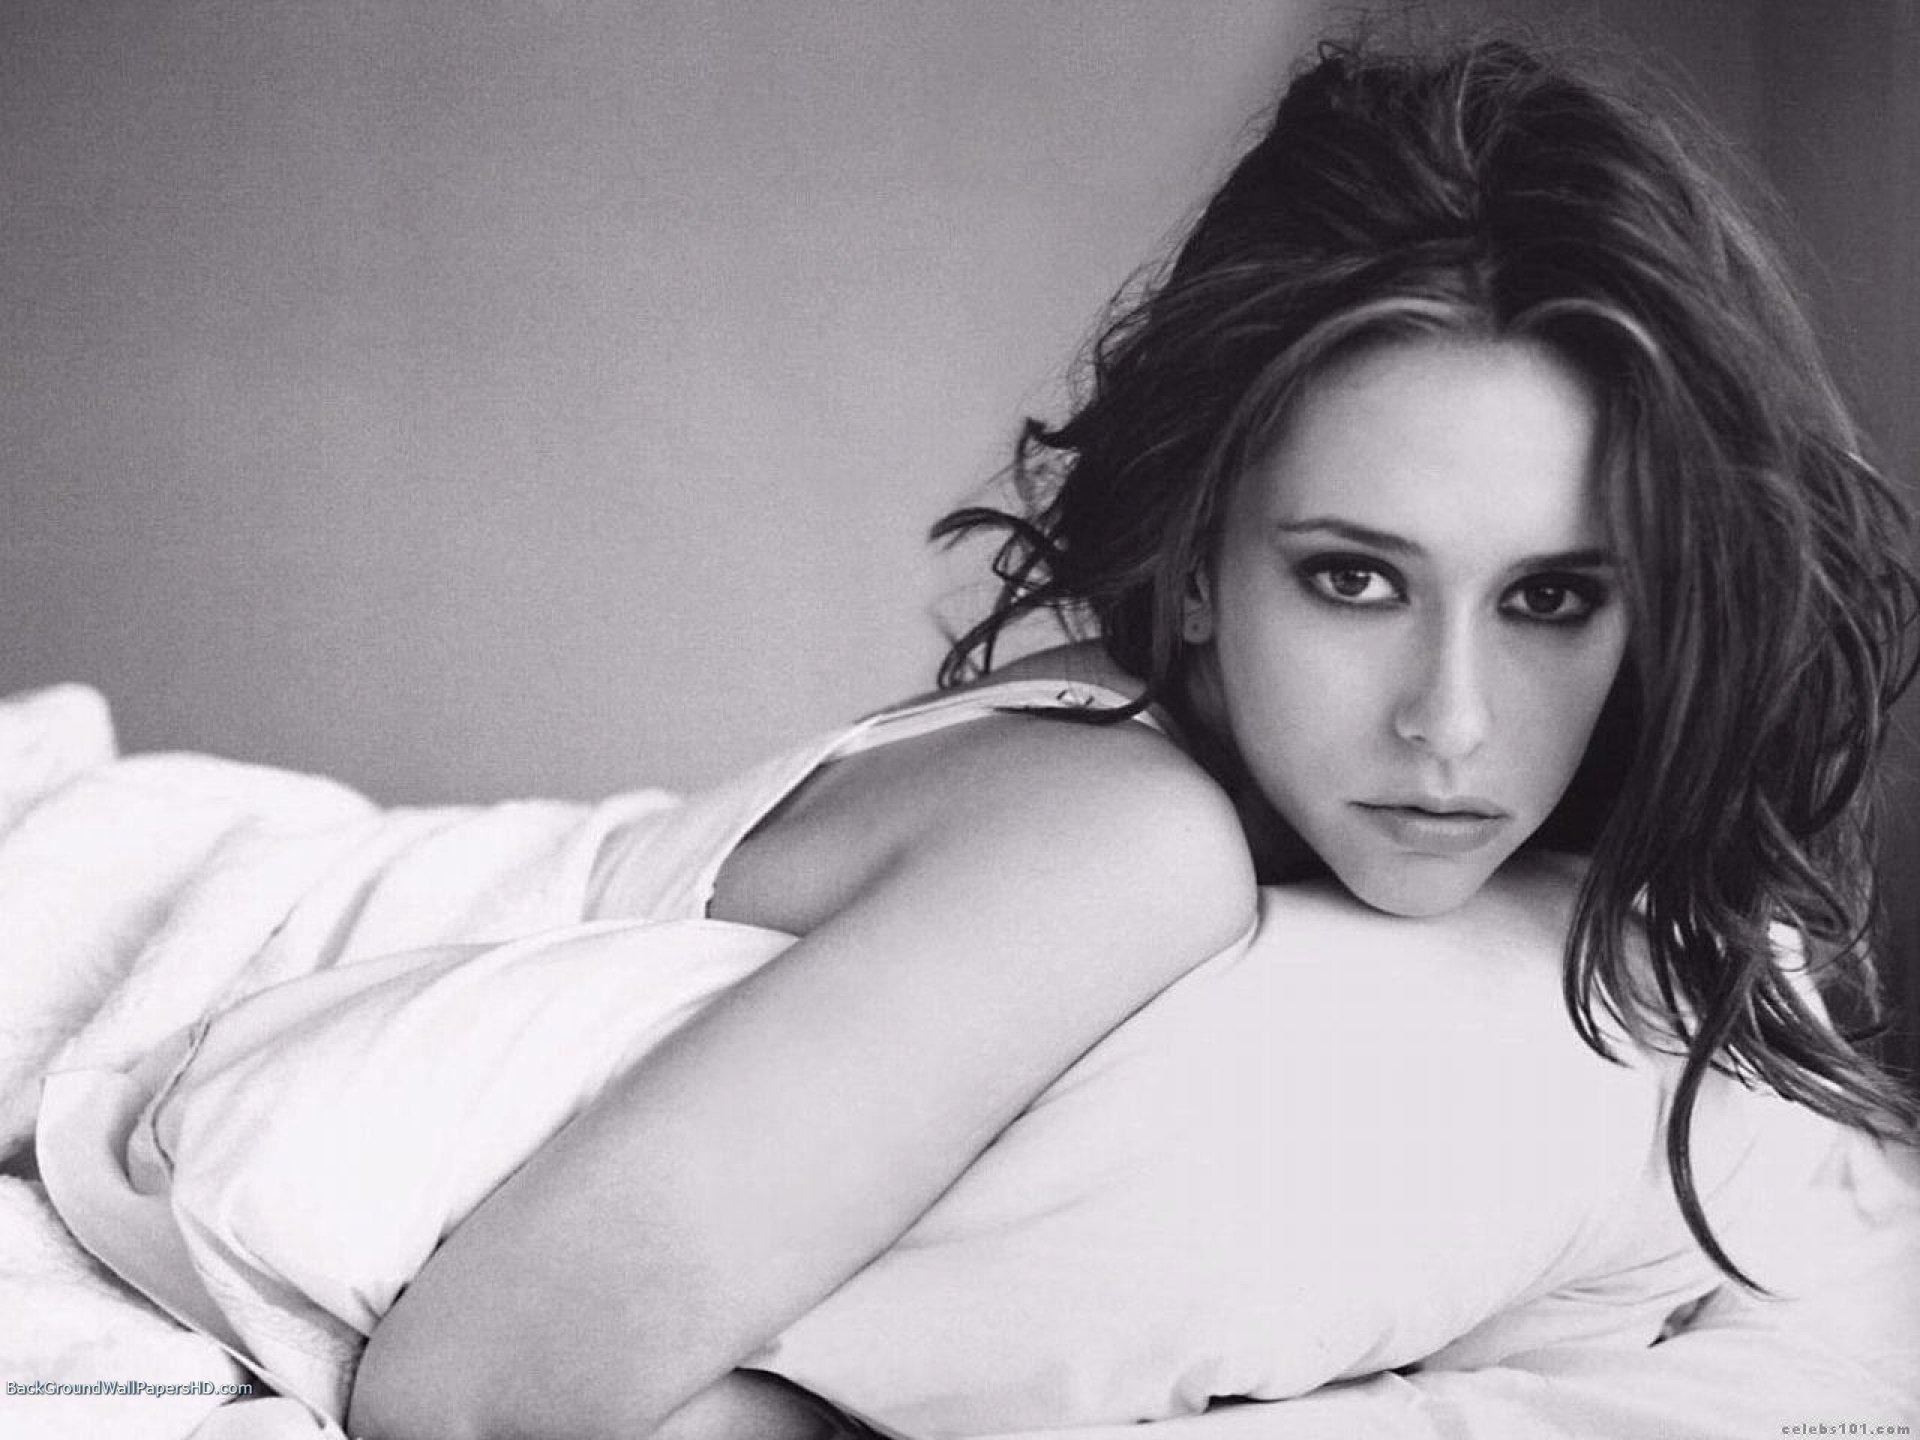 Jennifer love hewitt full hd wallpaper and background - J love wallpaper download ...